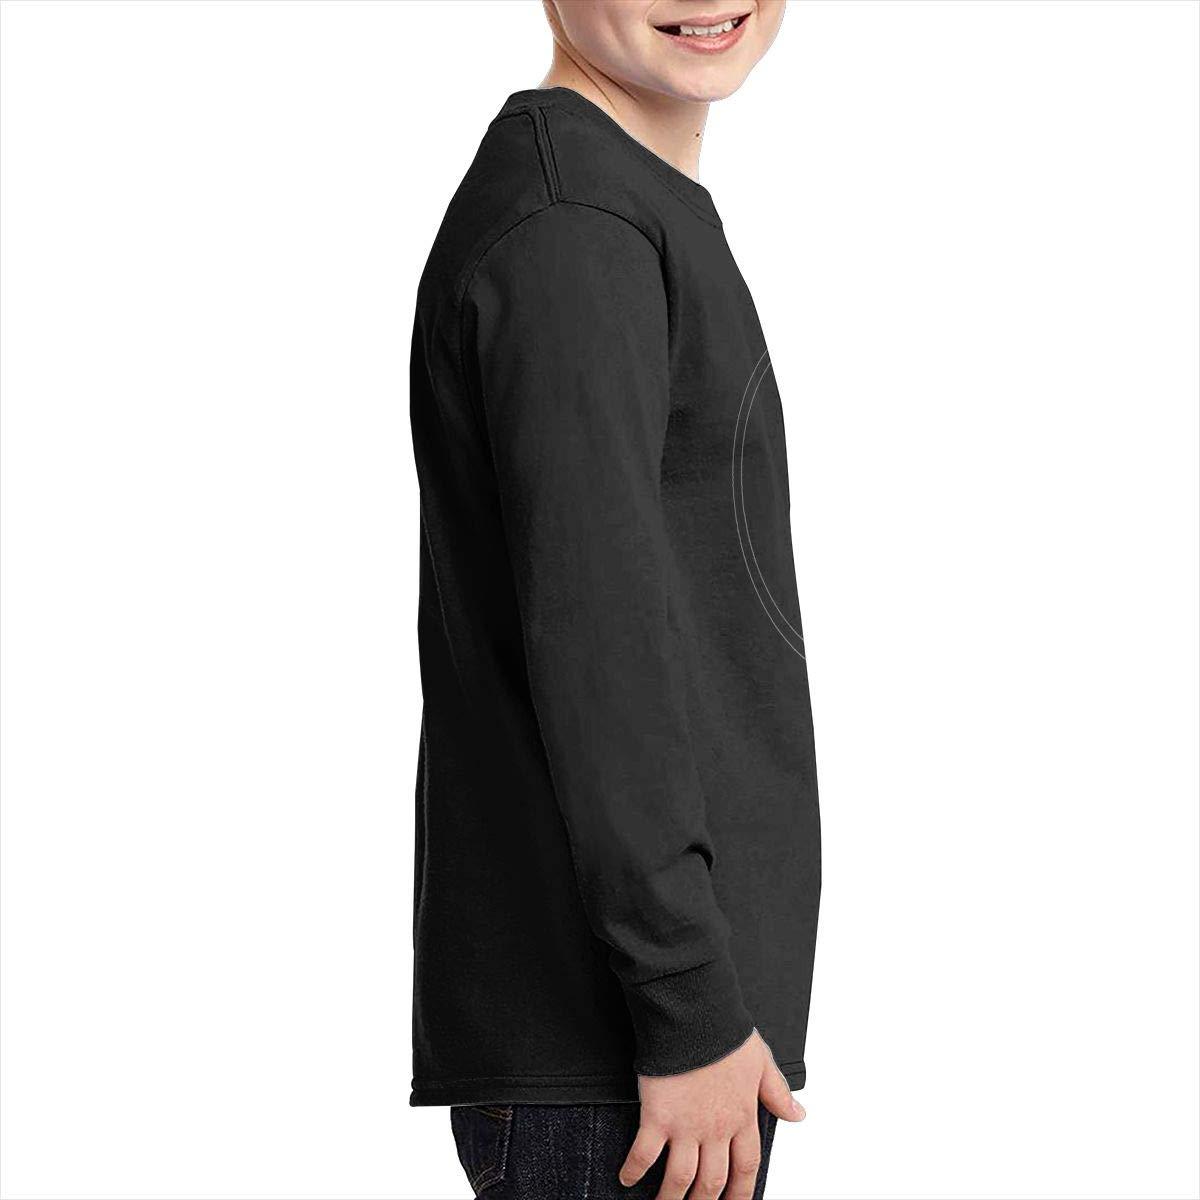 TWOSKILL Youth Bad Company Long Sleeves Shirt Boys Girls